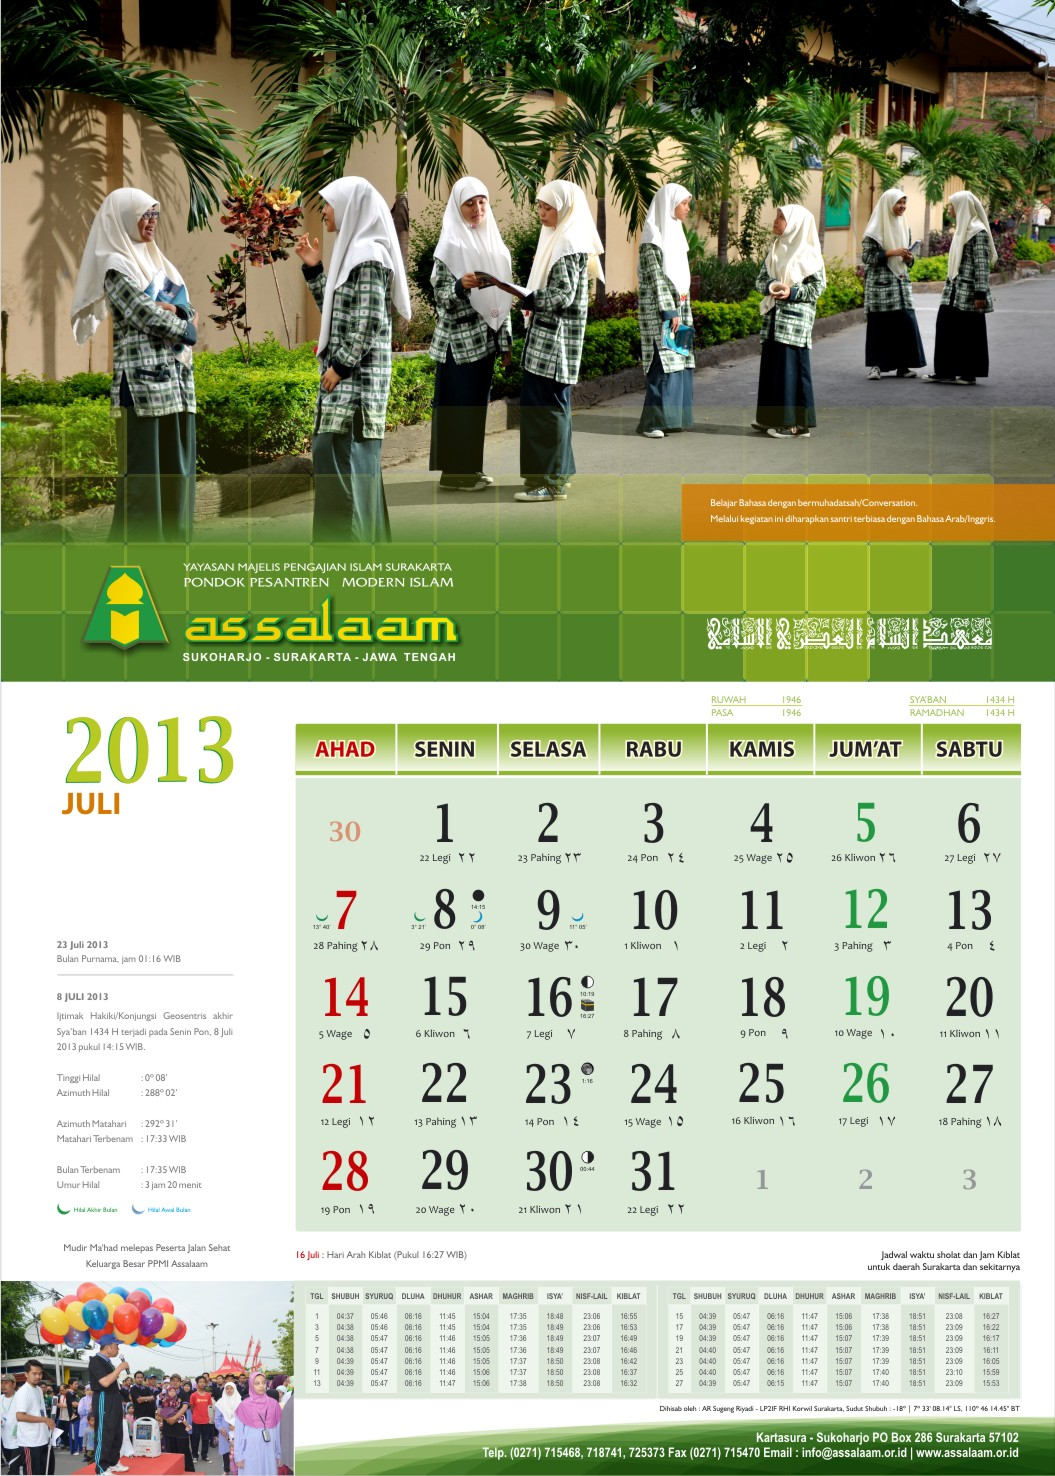 Download Kalender 2013 Lengkap (Hijriah, Masehi, Jawa) Dengan Hari